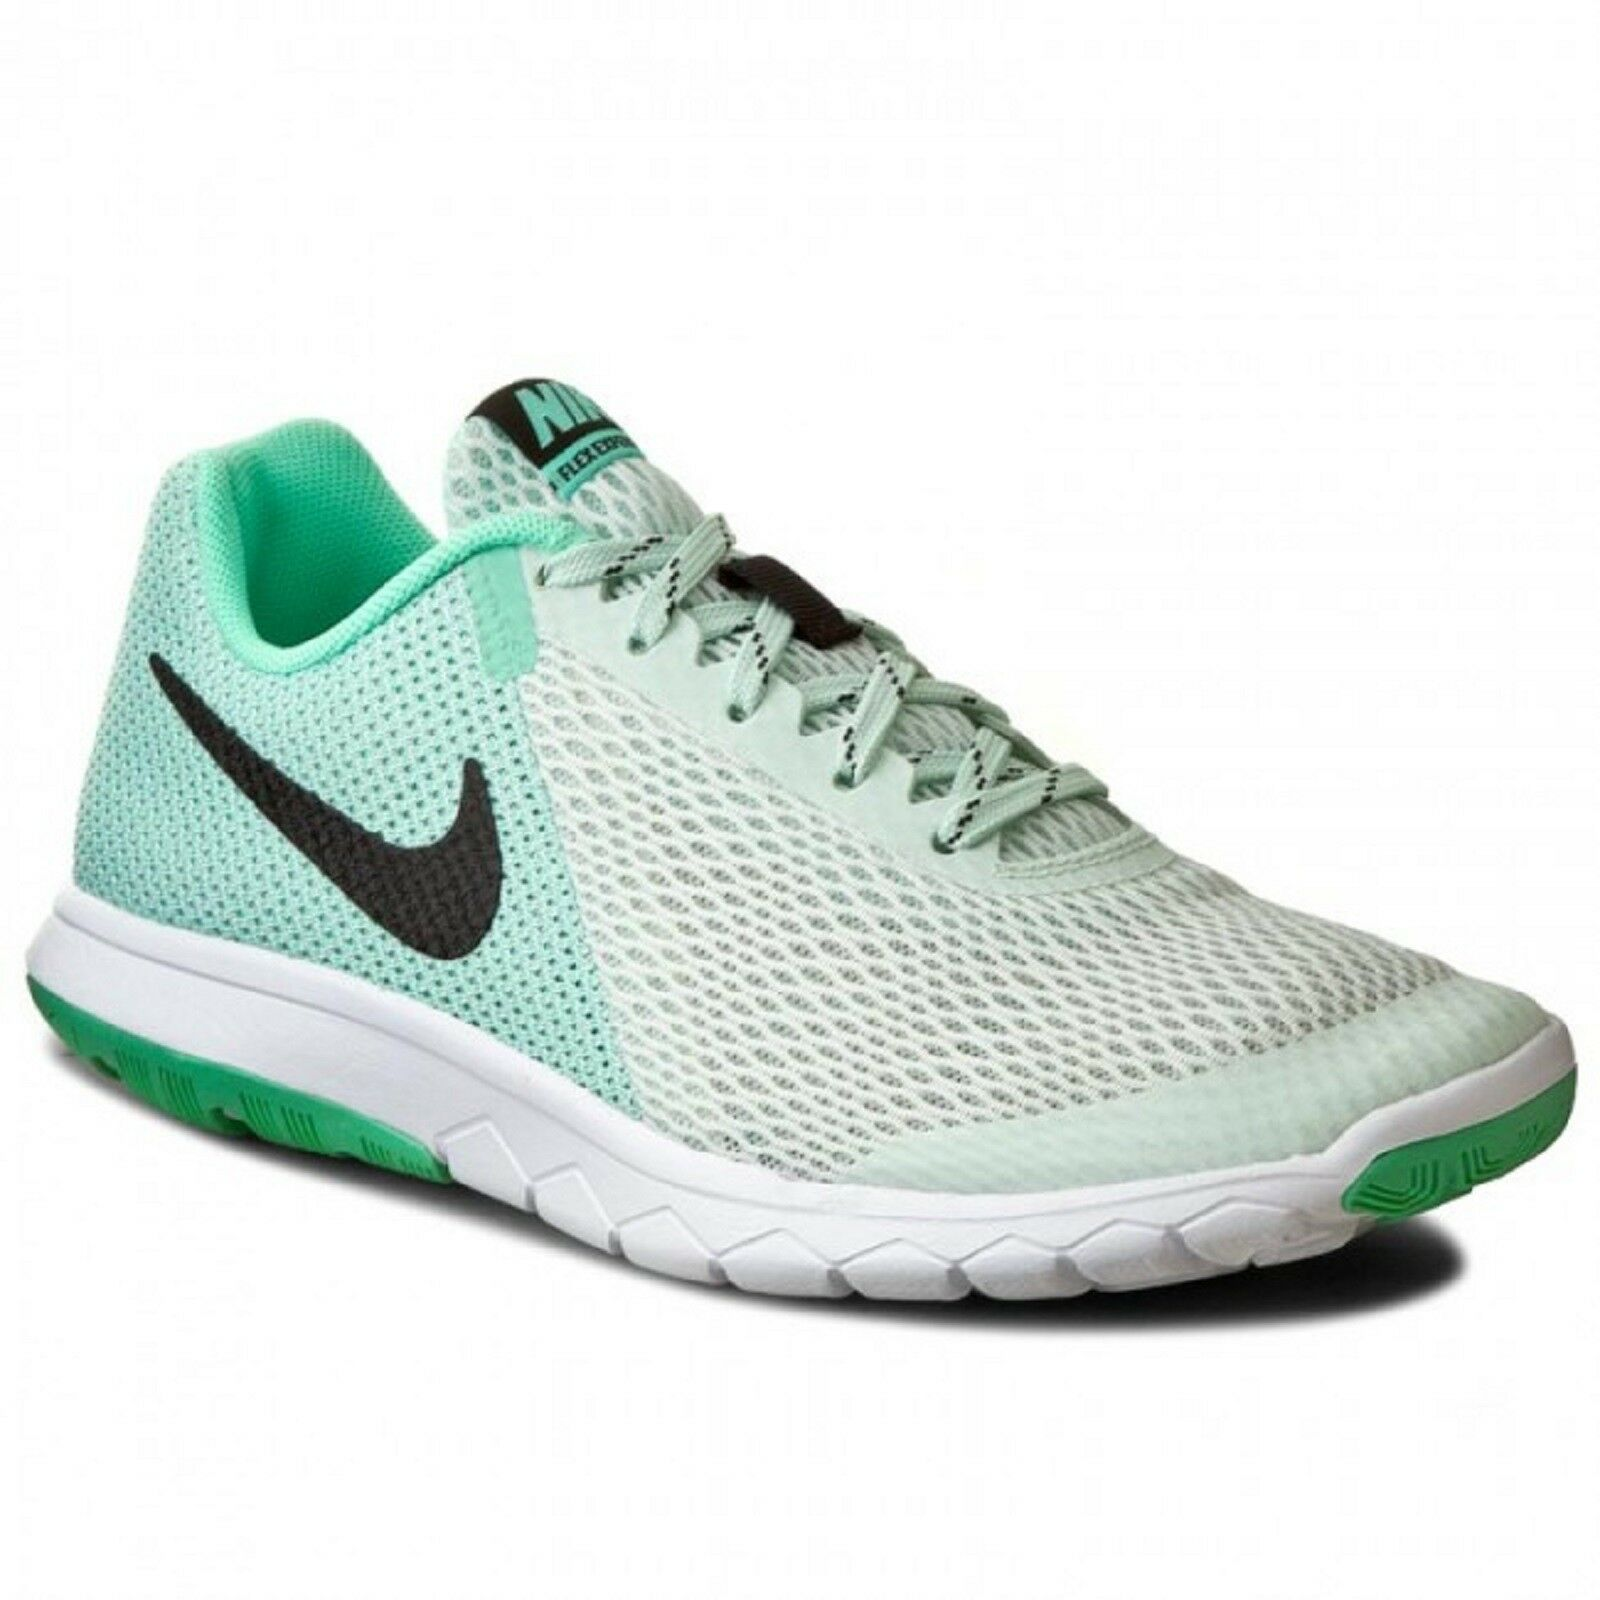 NIKE Womens 'FLEX EXPERIENCE RN 5' Running shoes Green Blck White  Sz. 8.5 M NIB